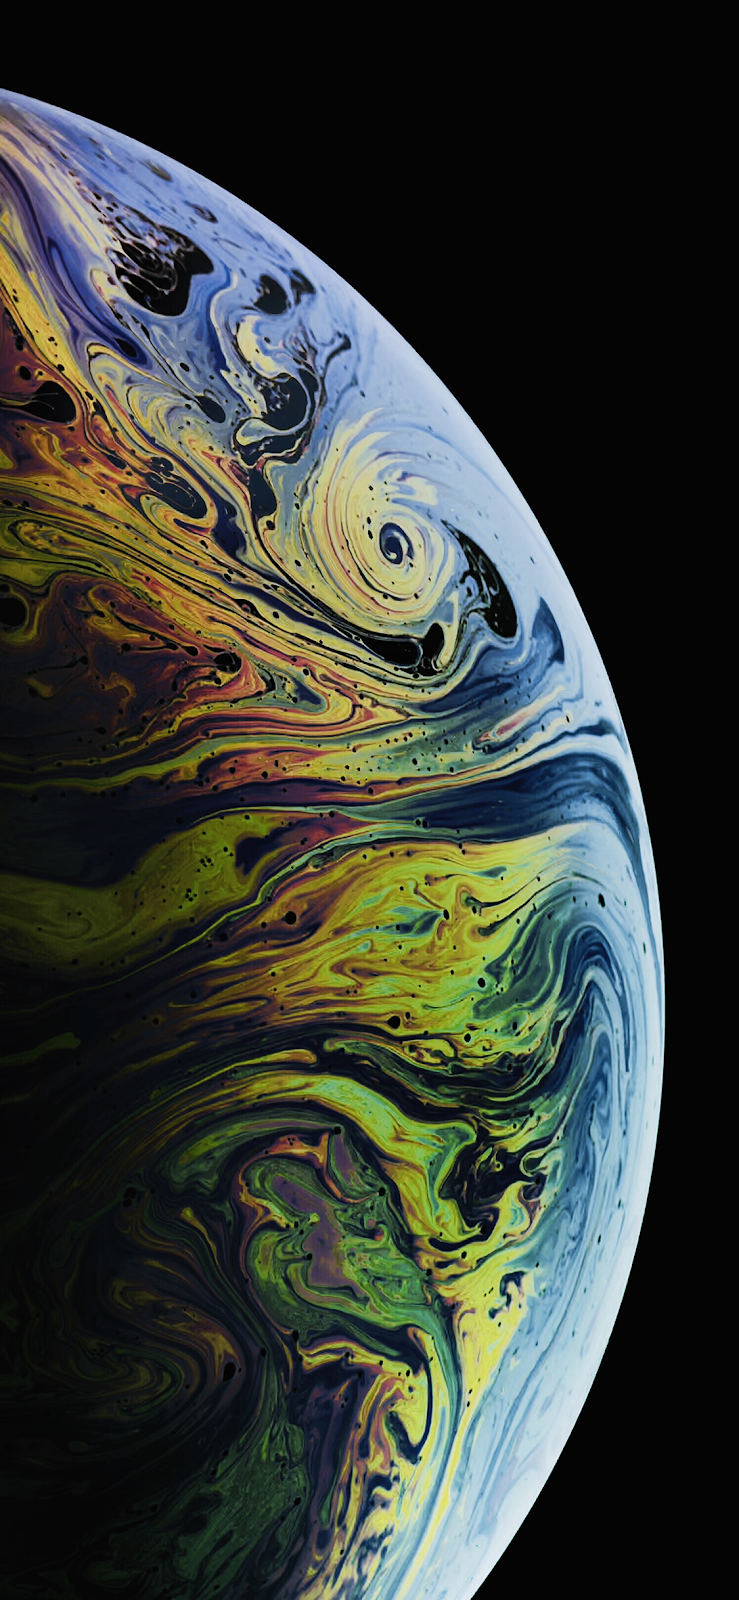 26 Iphone Xs Max Earth Wallpapers On Wallpapersafari